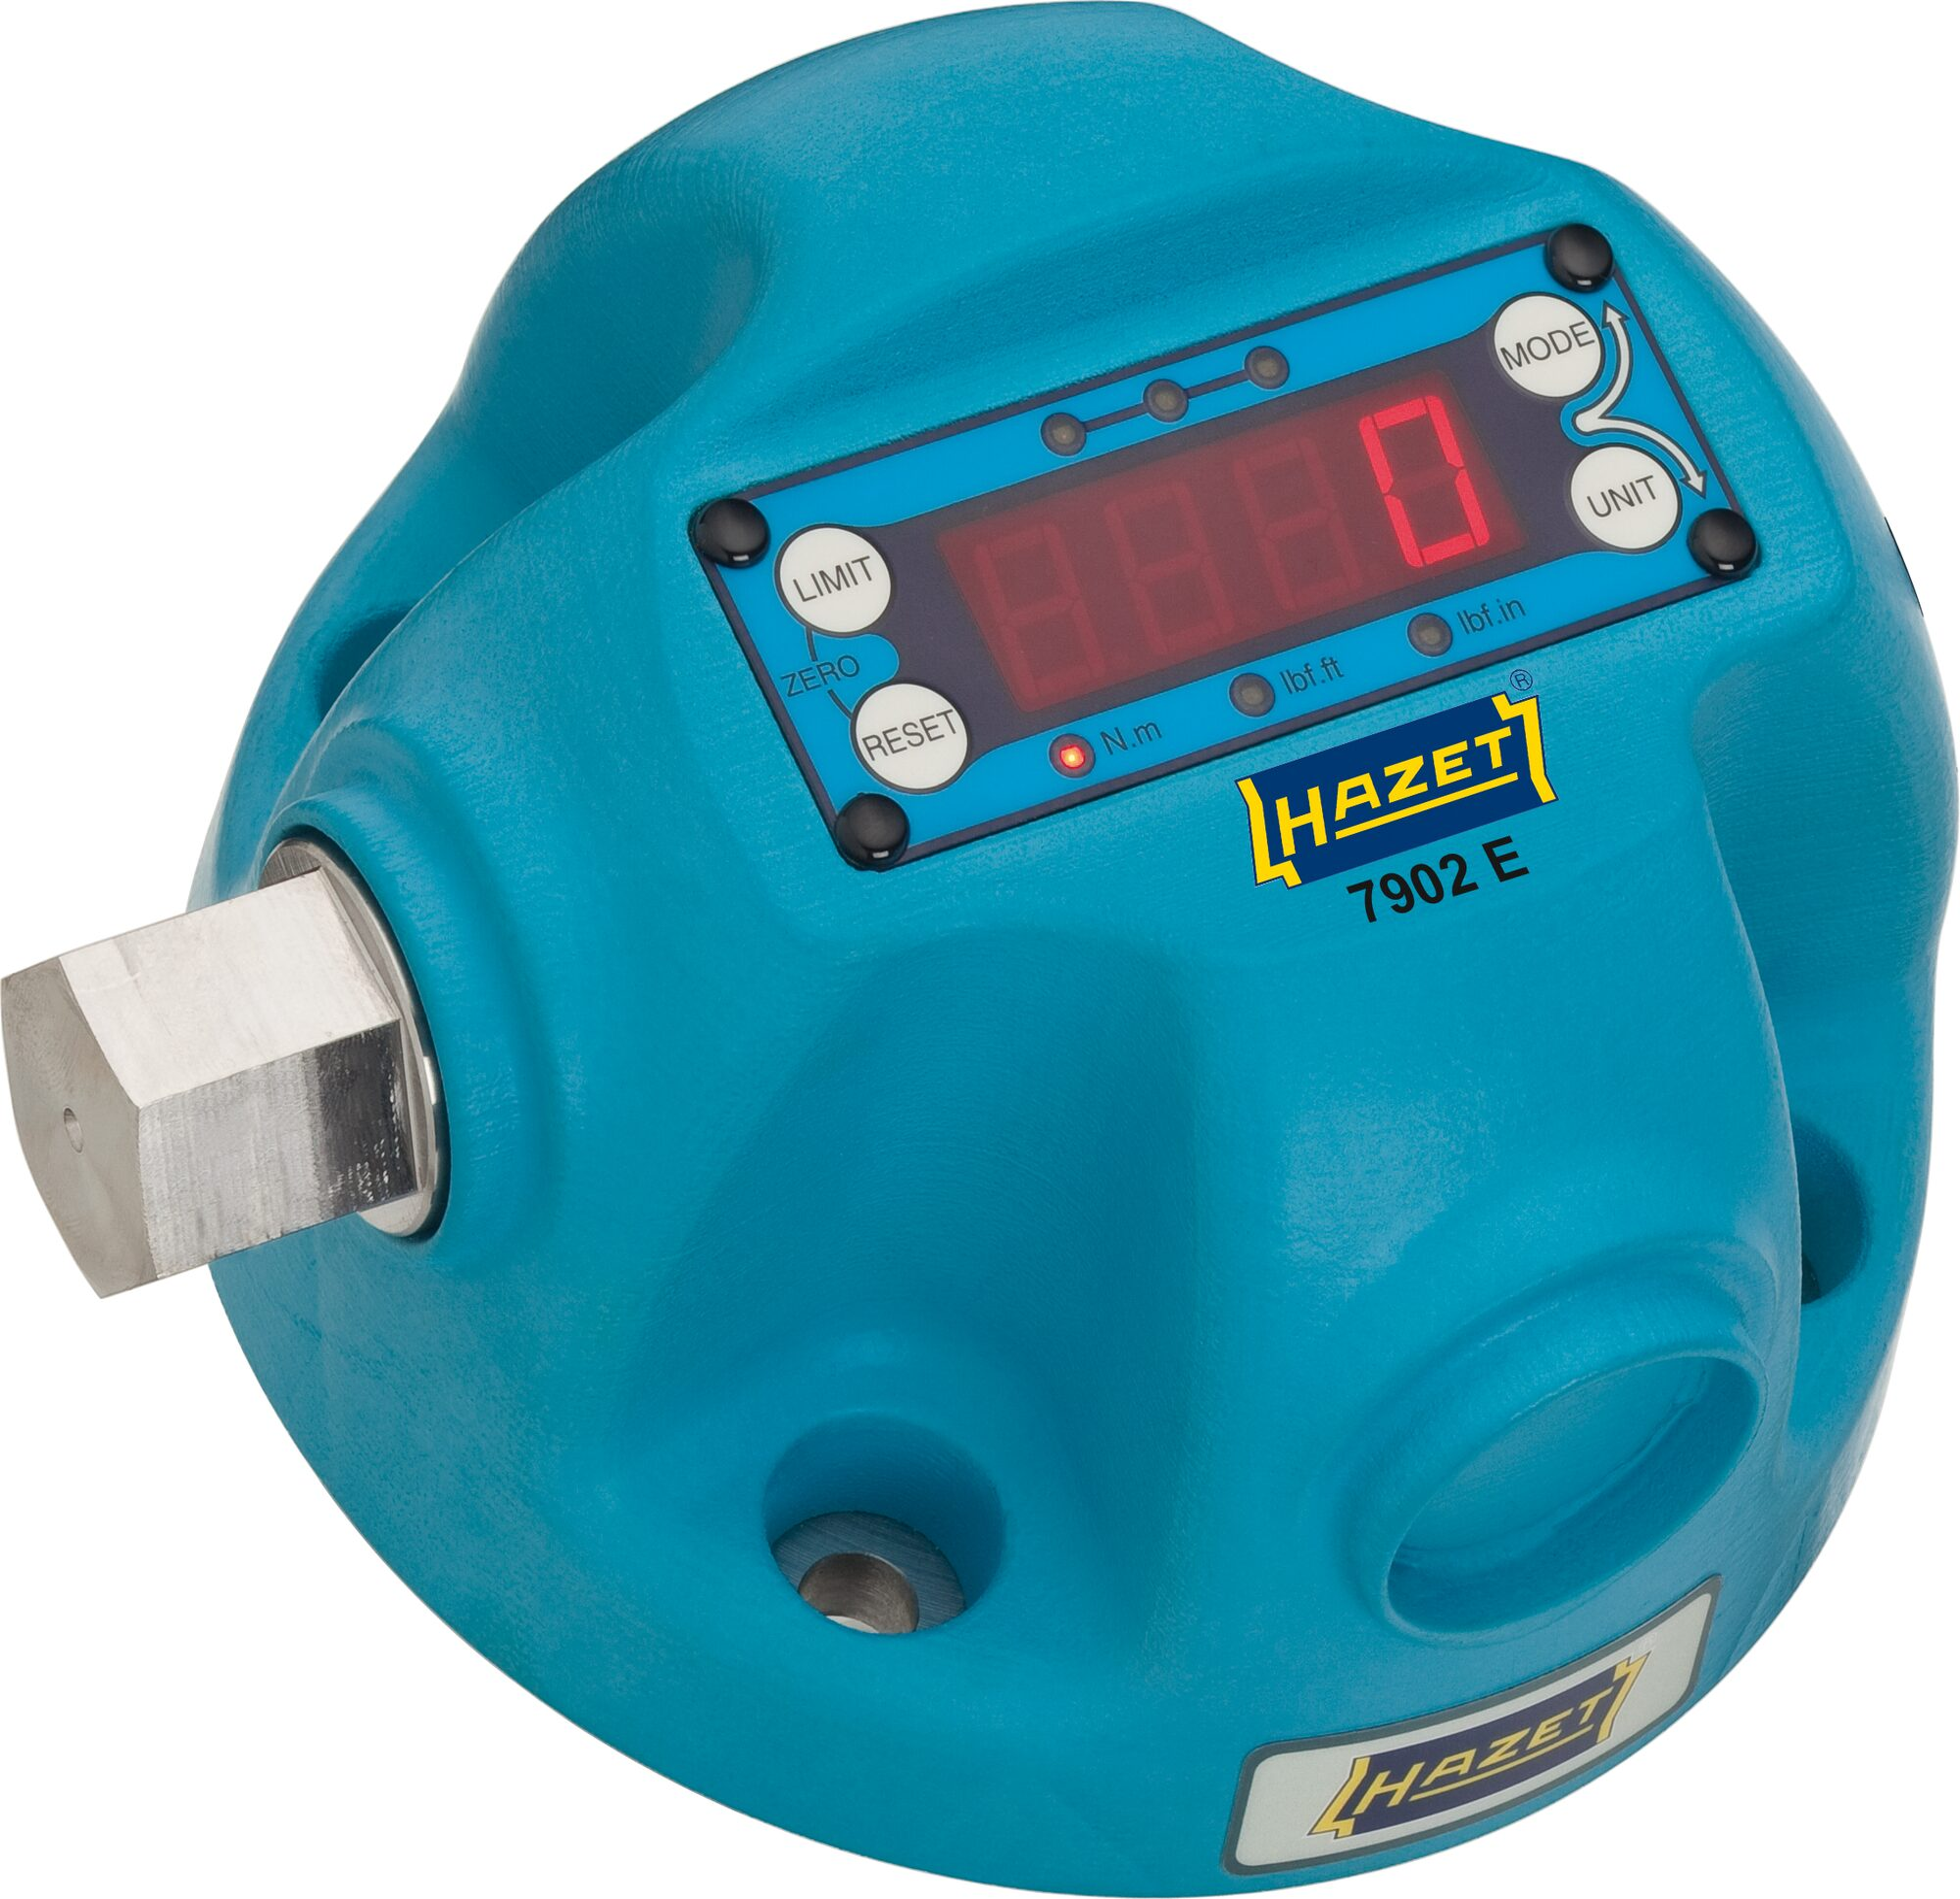 HAZET Drehmoment-Prüfgerät ∙ elektronisch ∙ 100–1000Nm 7902E ∙ Nm min-max: 100–1000 Nm